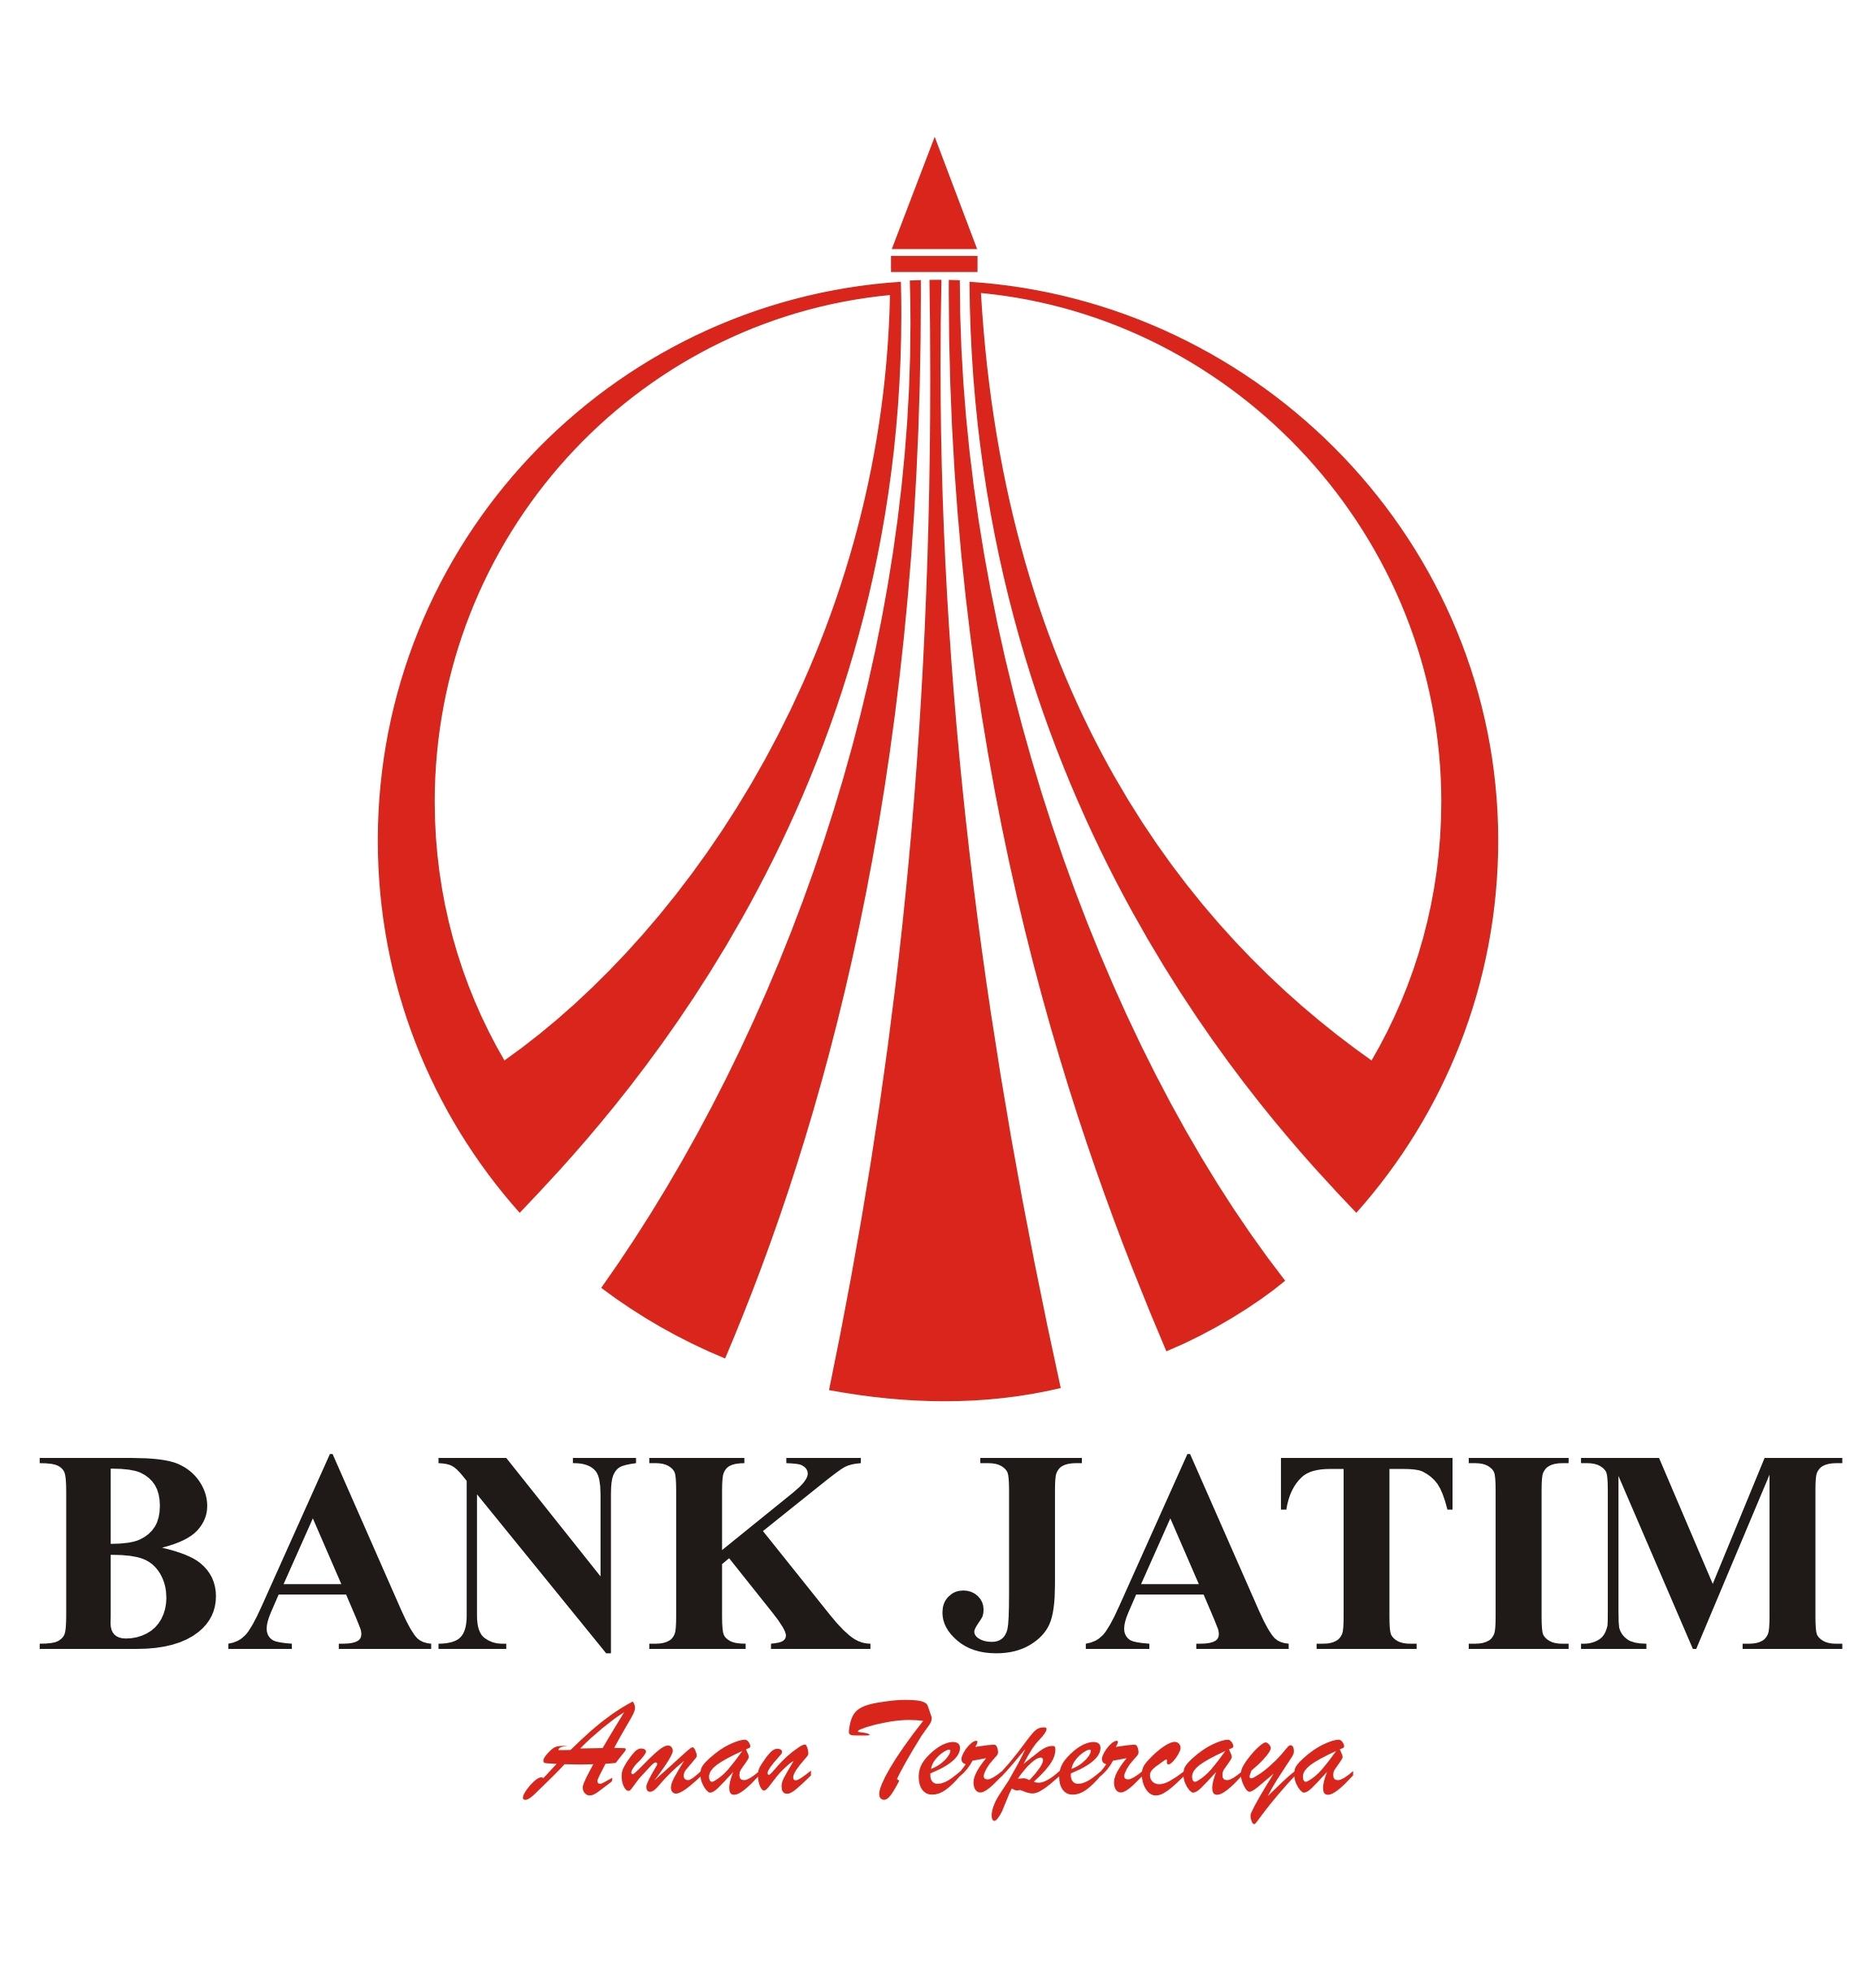 Bpd Jatim List Of Banks In Indonesia Wikipedia The Free Encyclopedia Logo Jatim Bourse On Thursday July Jatim Centralizing Bank Jun